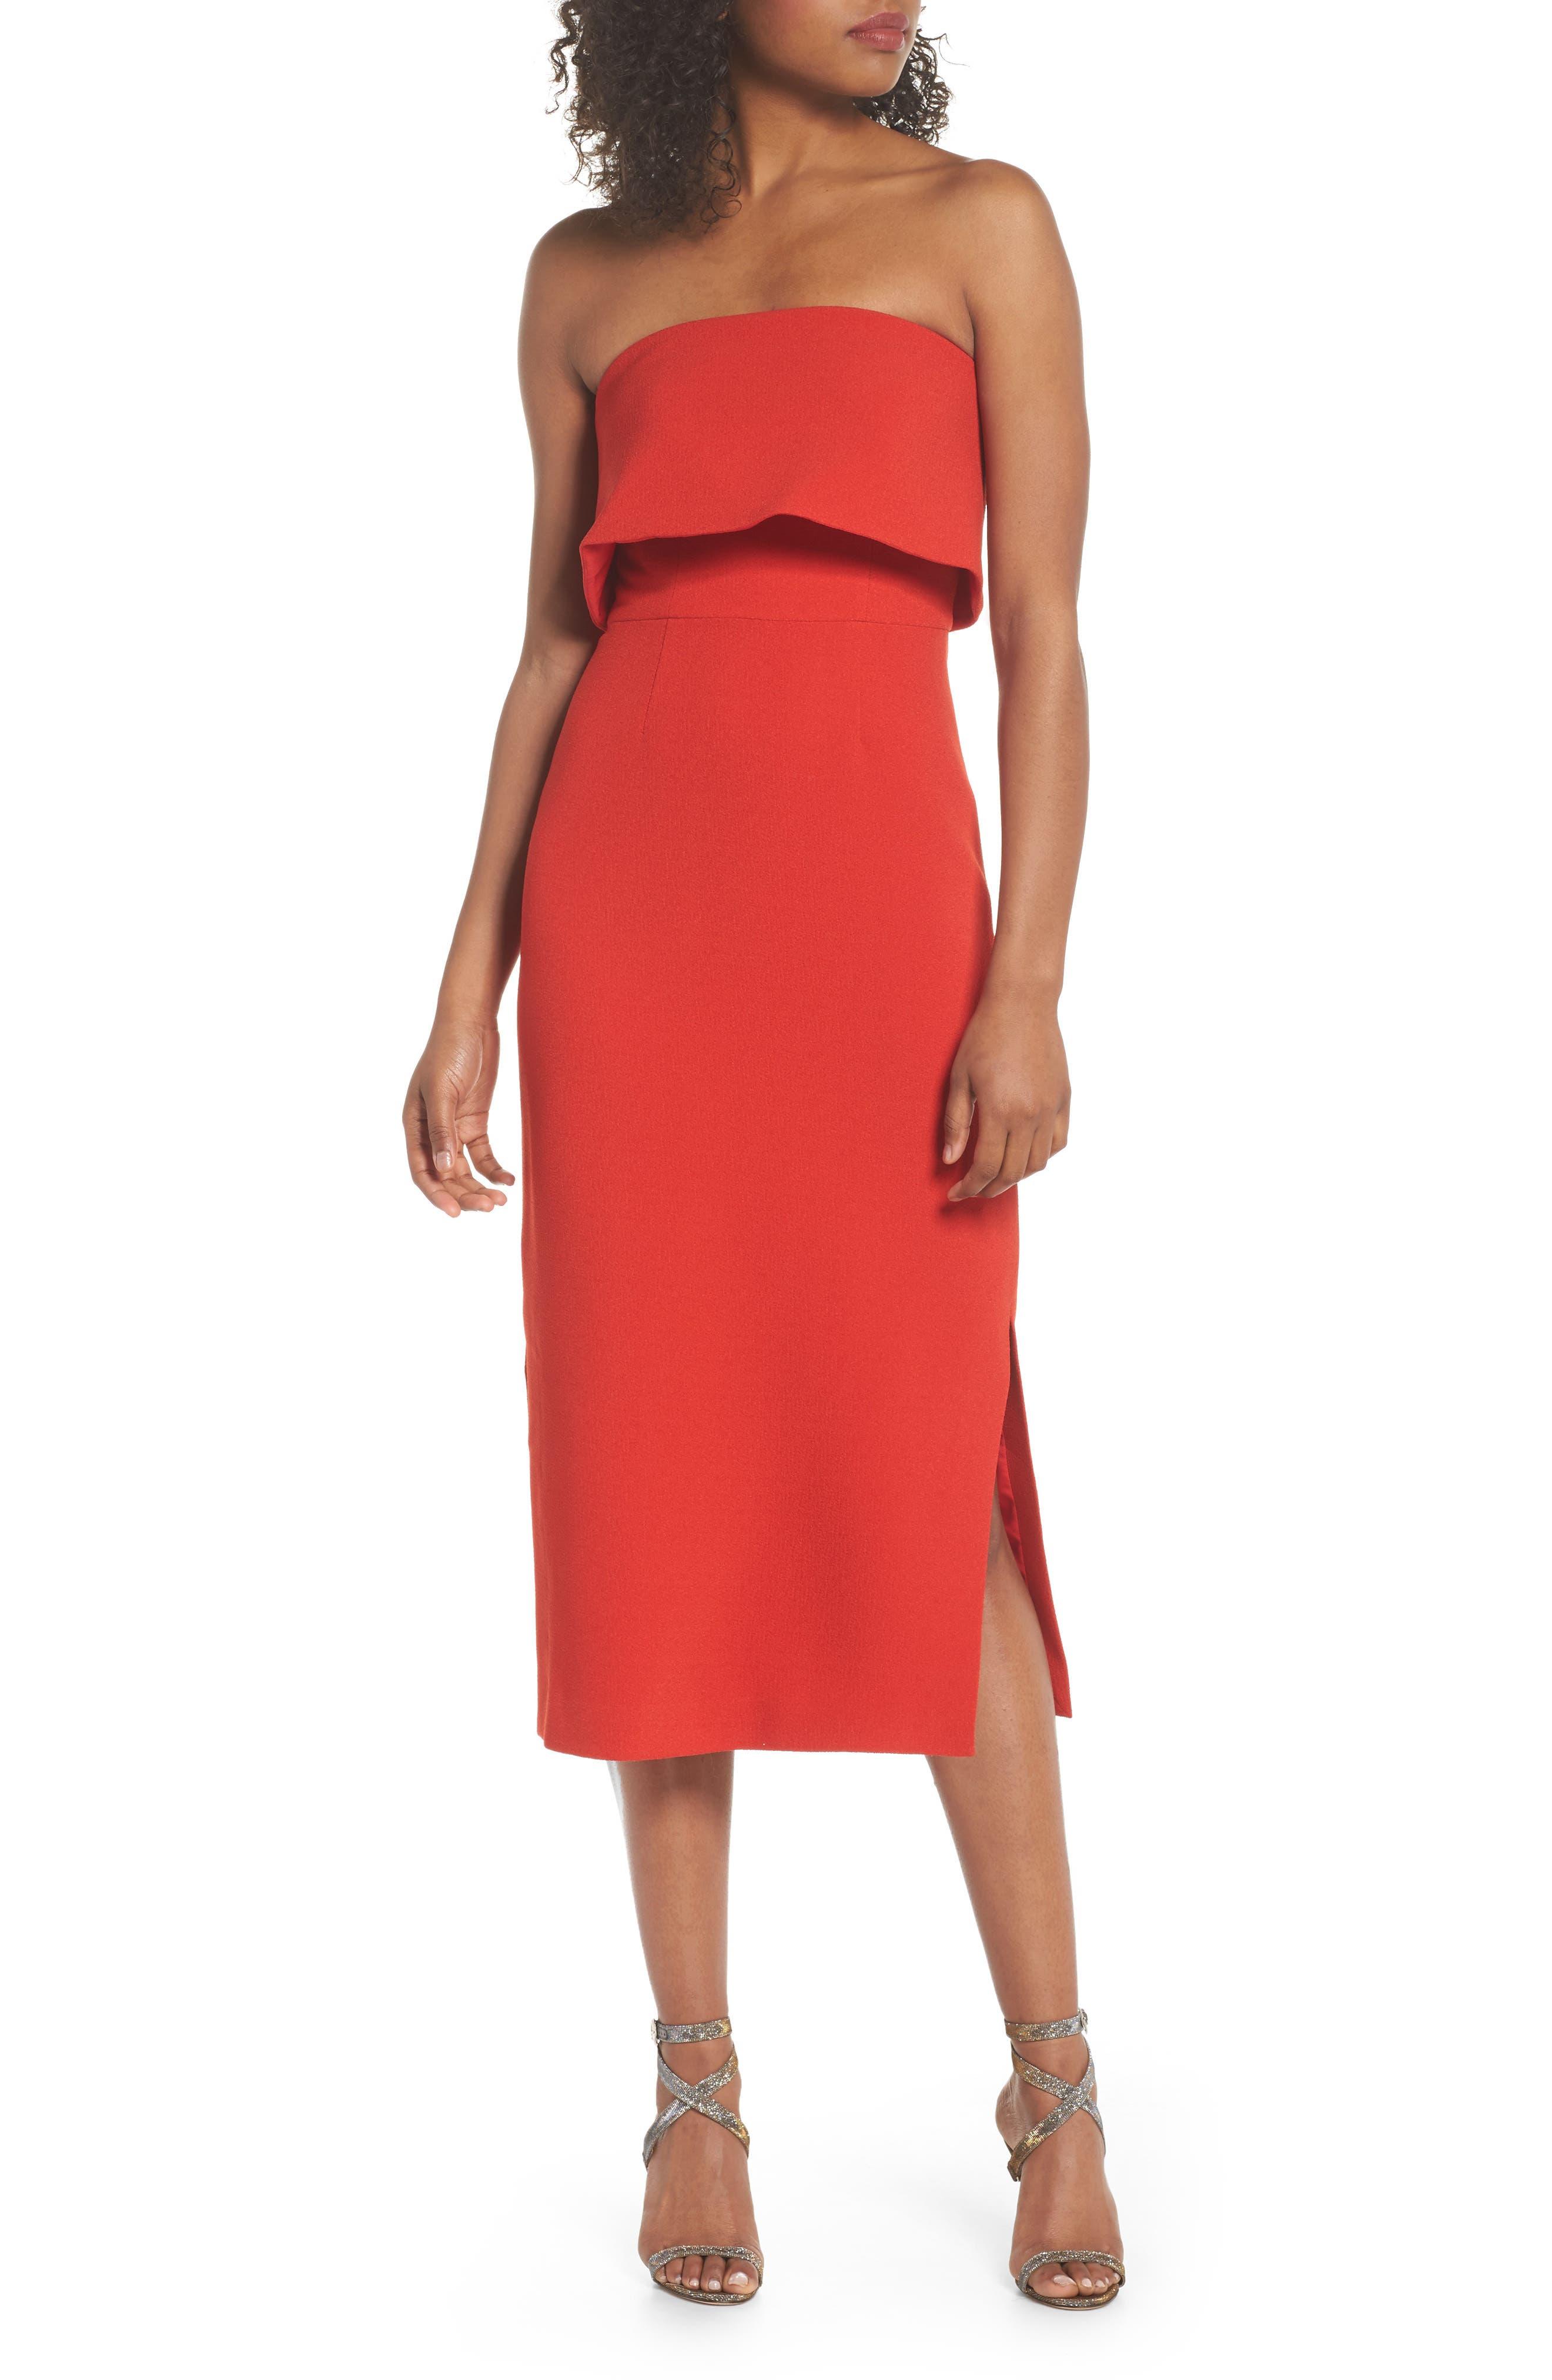 Entice Strapless Midi Dress,                         Main,                         color, Red